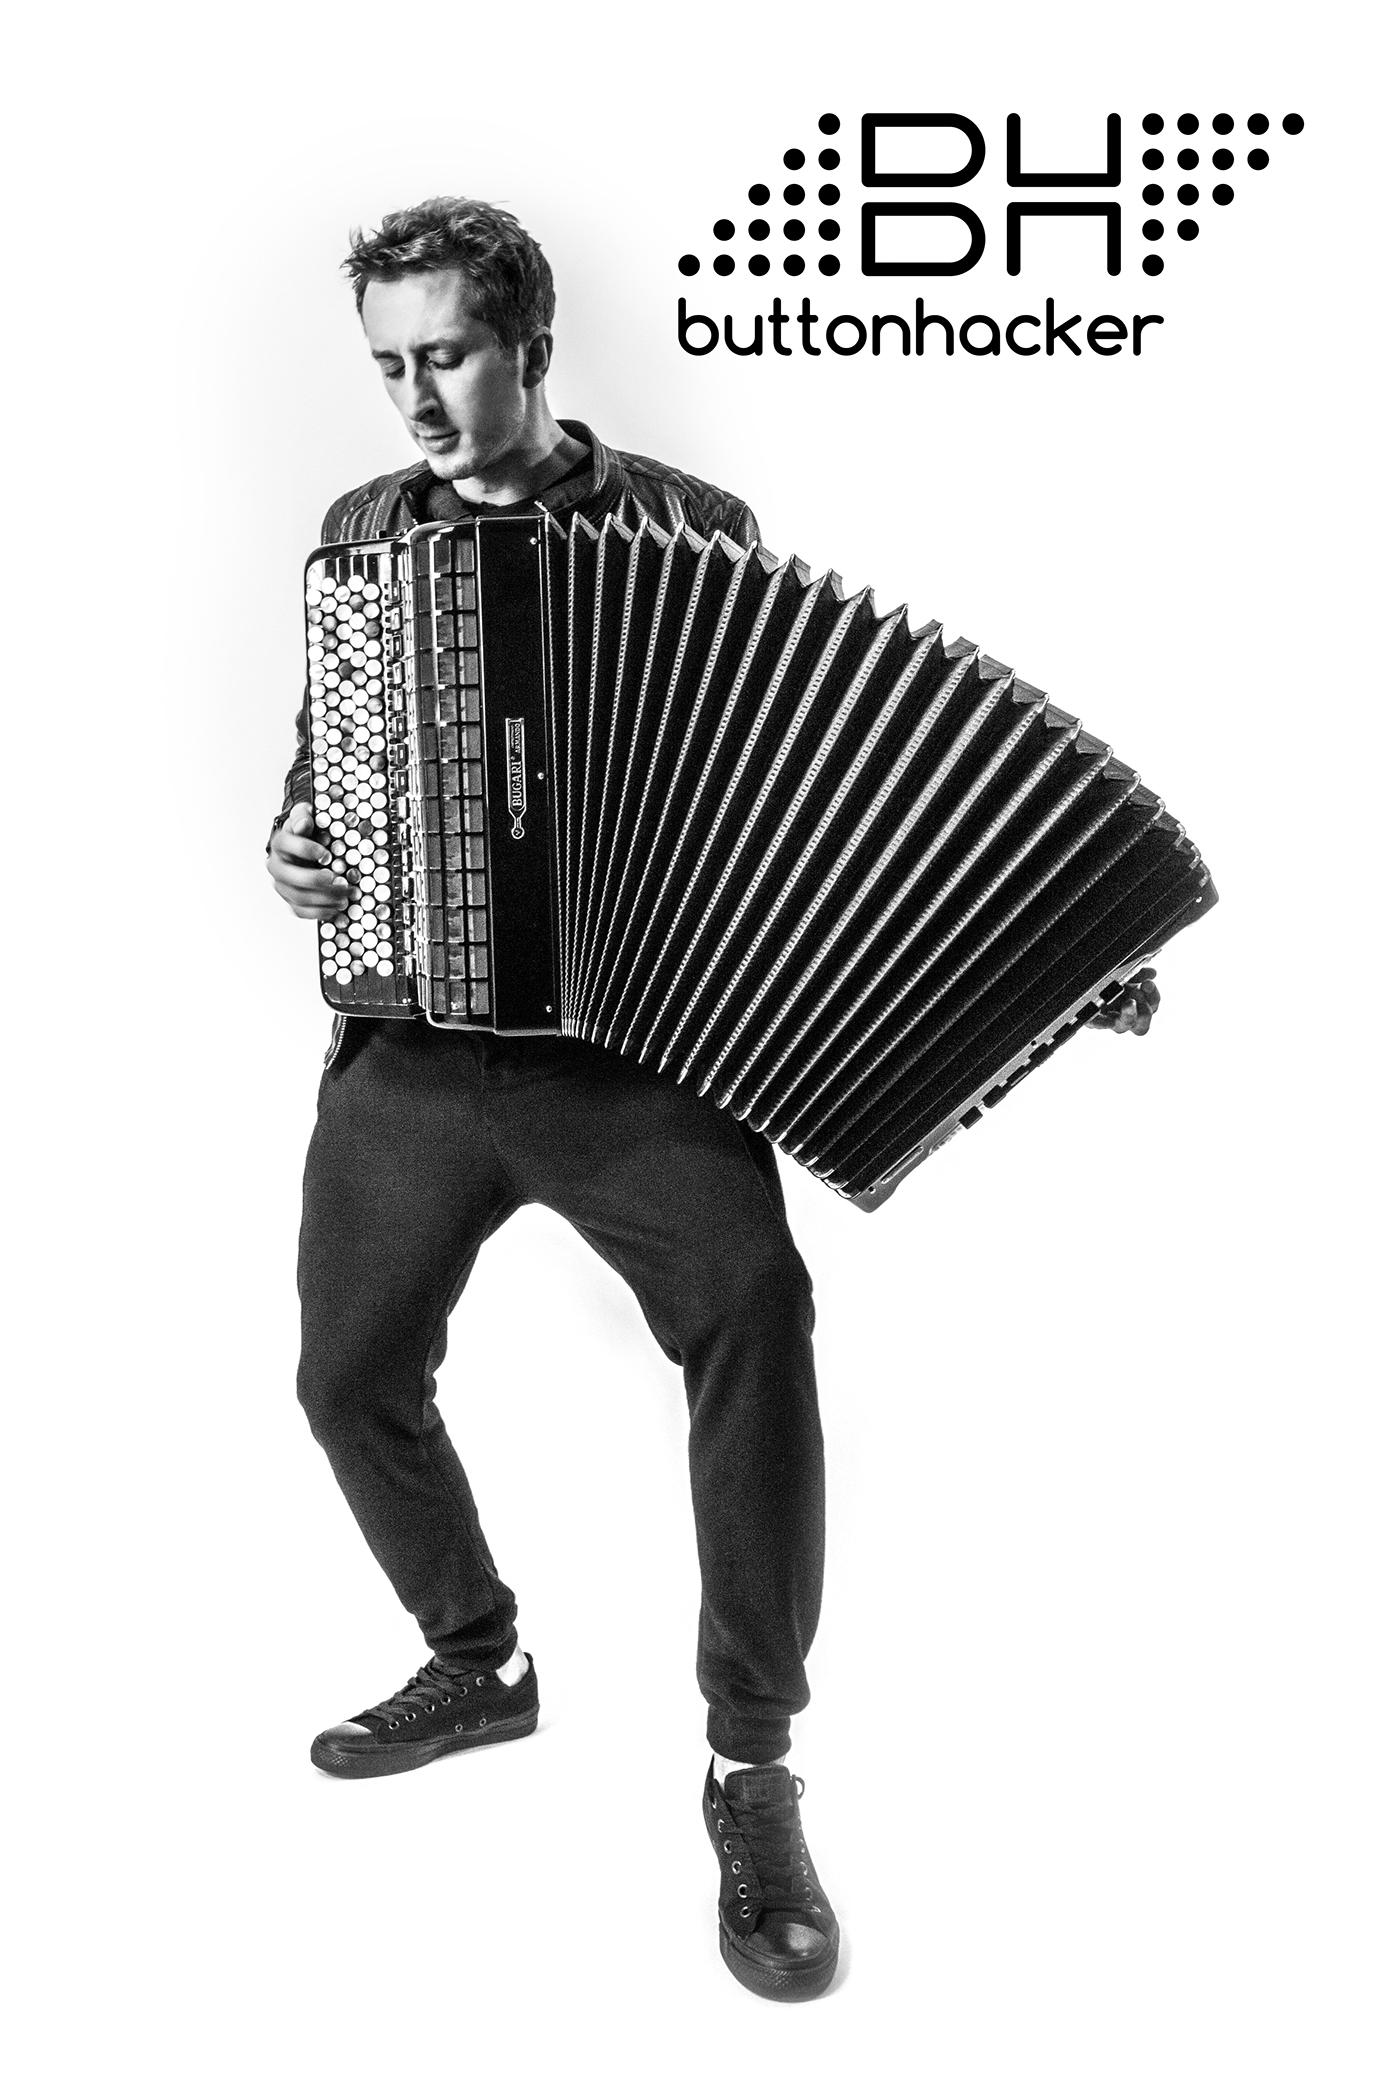 buttonhacker logo photo music video grading accordion black and white portrait lightleaks handsome